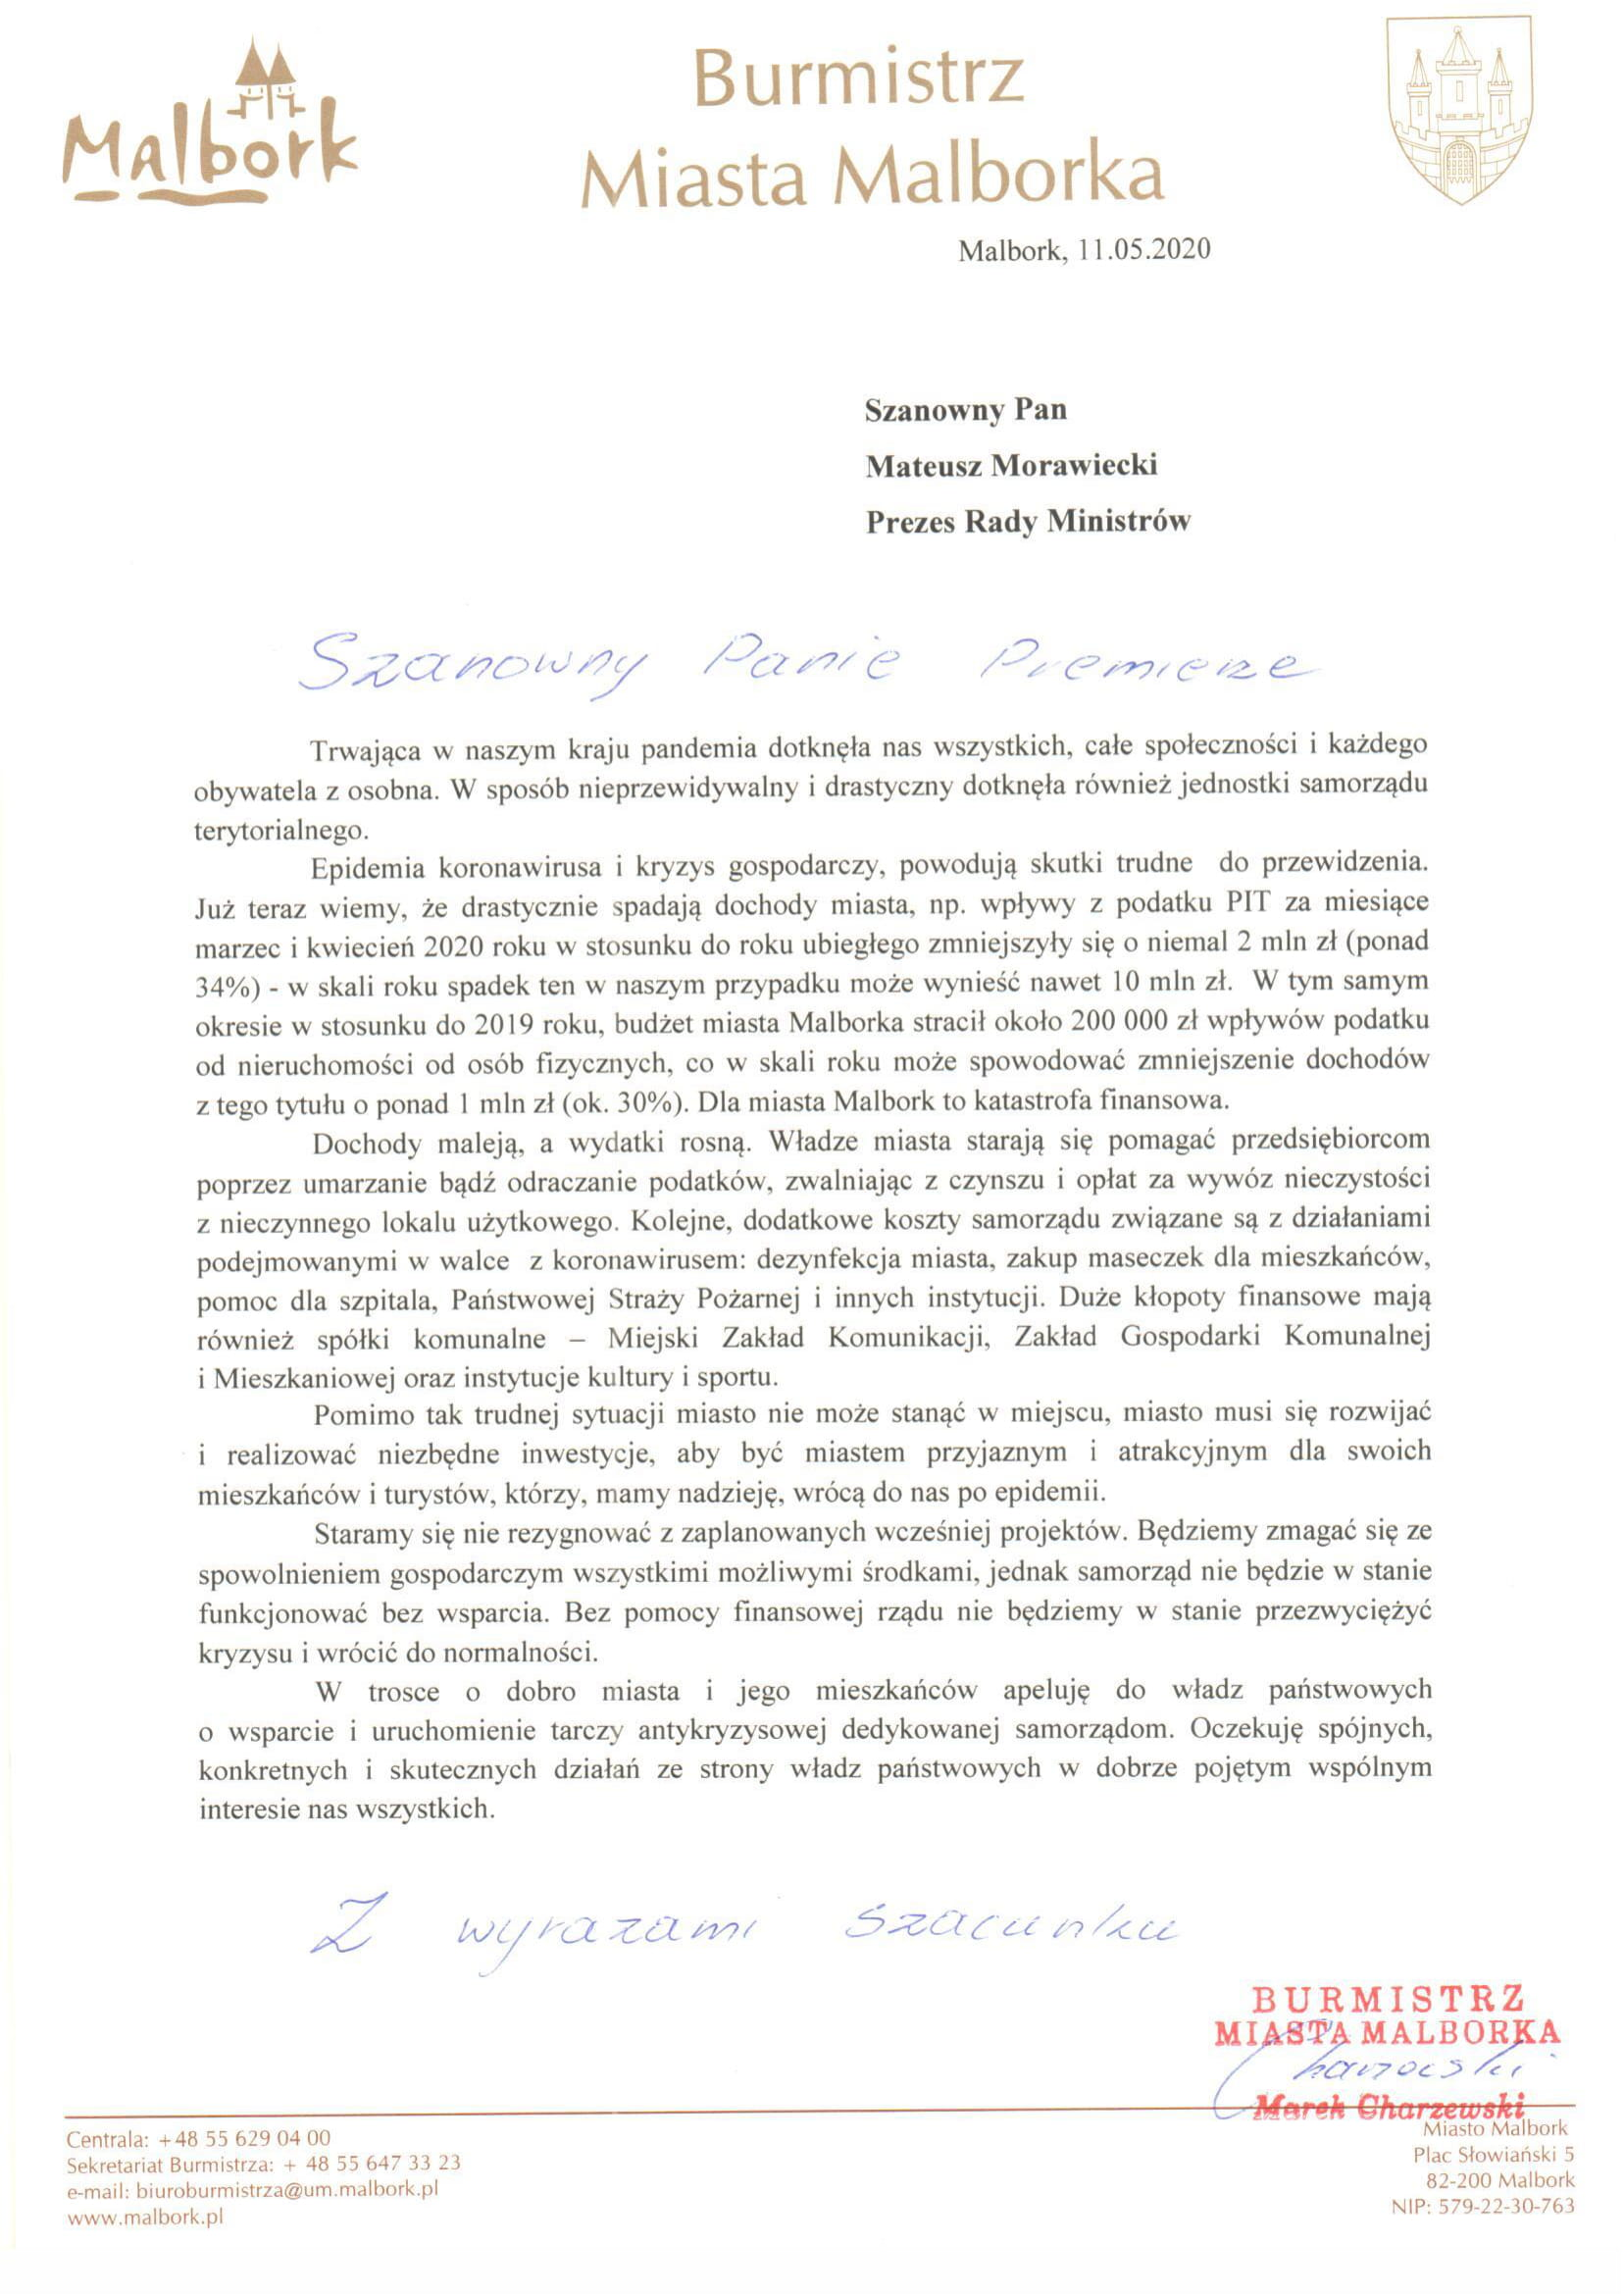 http://m.82-200.pl/2020/05/orig/pimo-do-premiera-1-5856.jpg